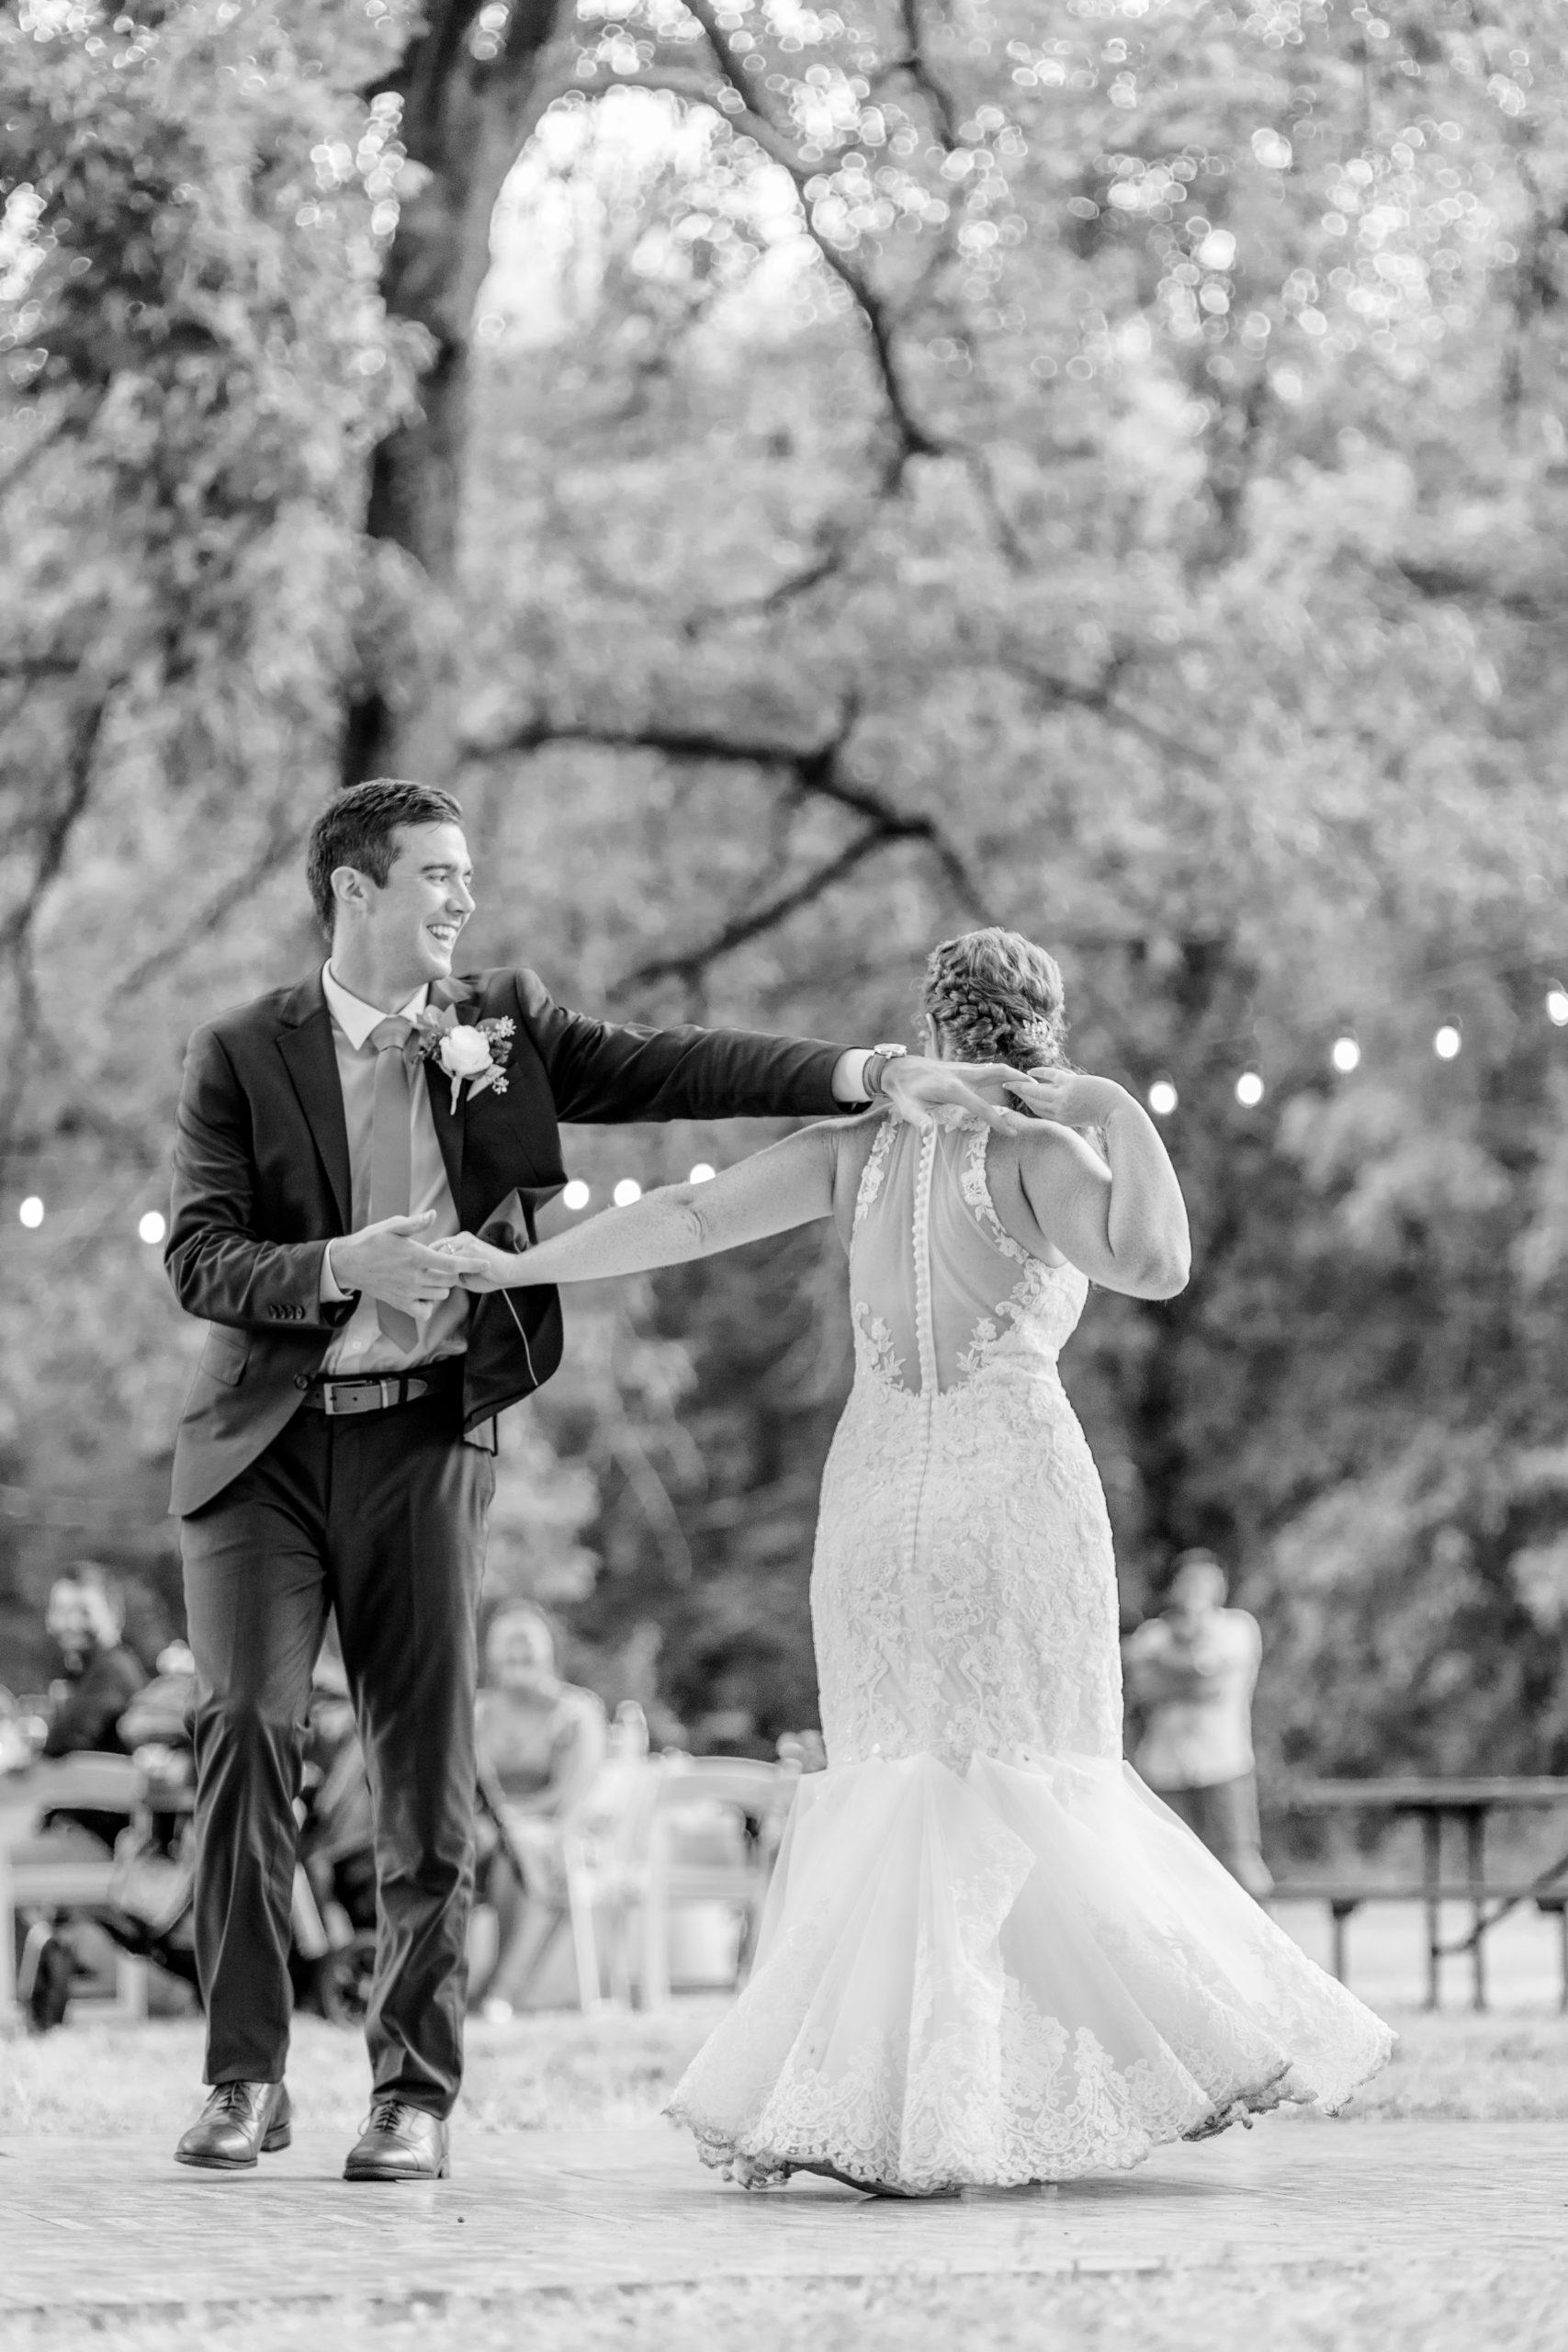 bride and groom dancing, woodland wedding, summer romance wedding, night wedding, black and white wedding photography, southern illinois wedding photography